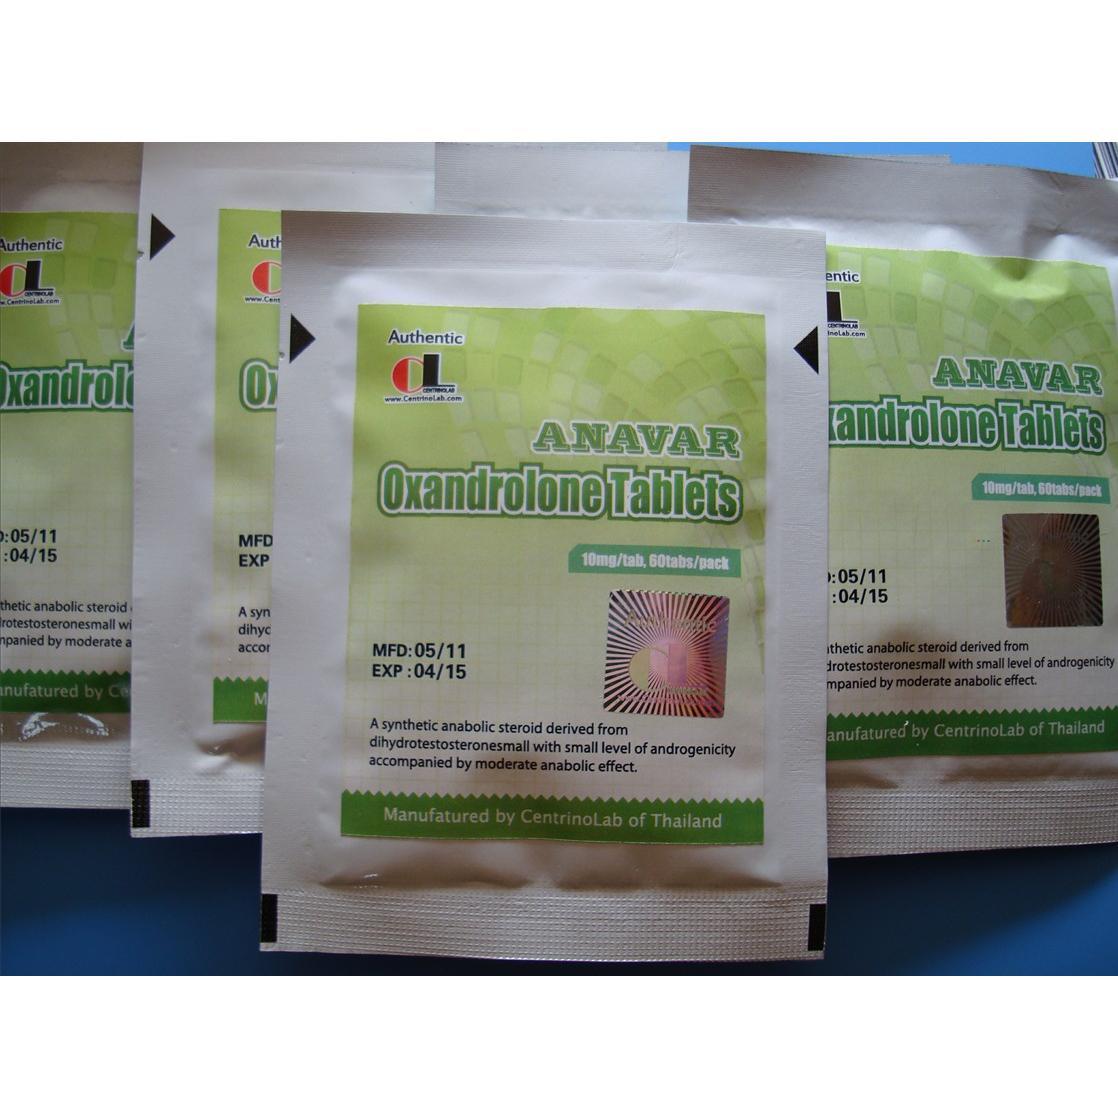 Anavar (Oxandrolone)